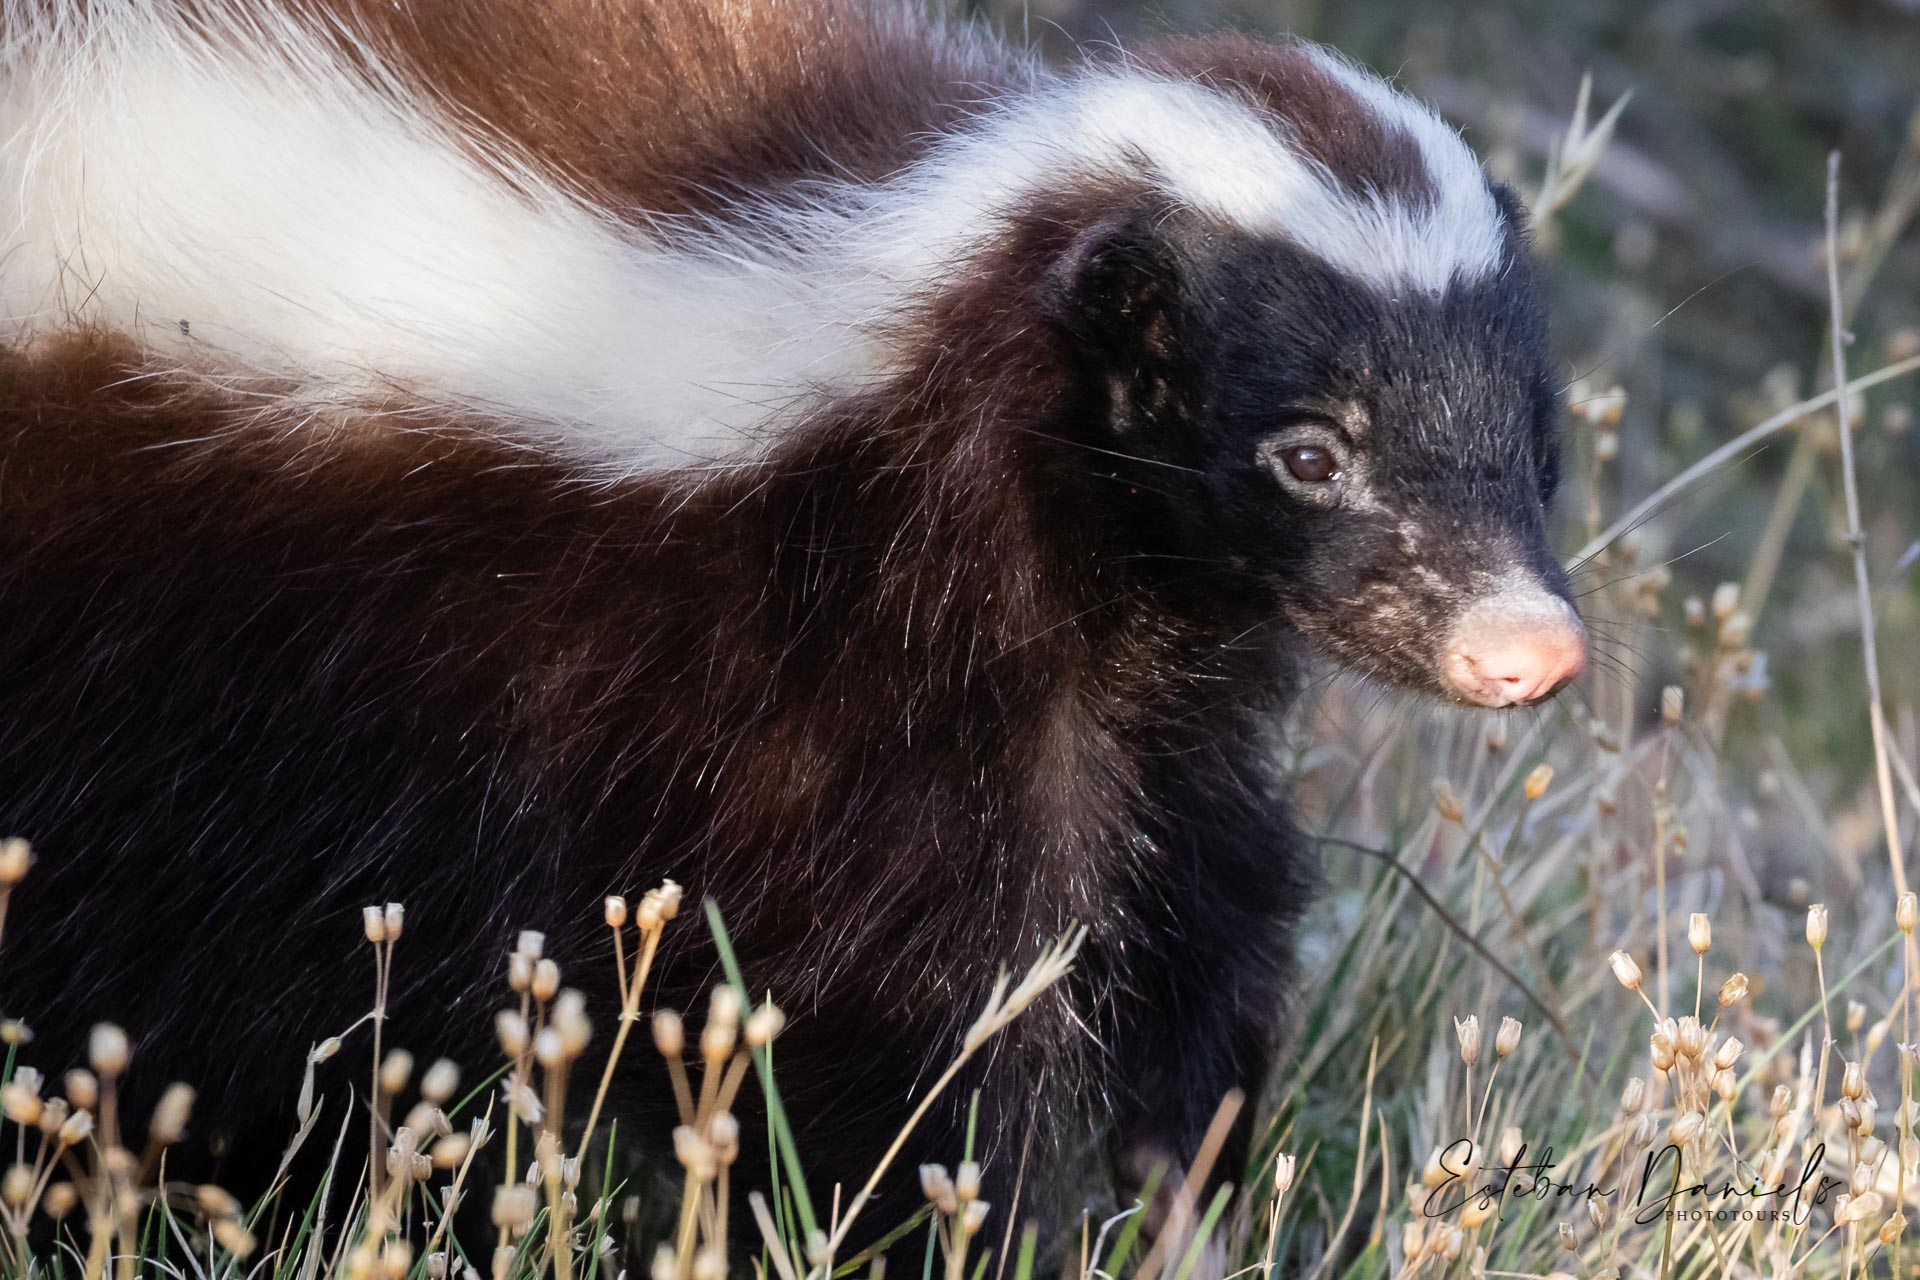 Patagonian Skunk